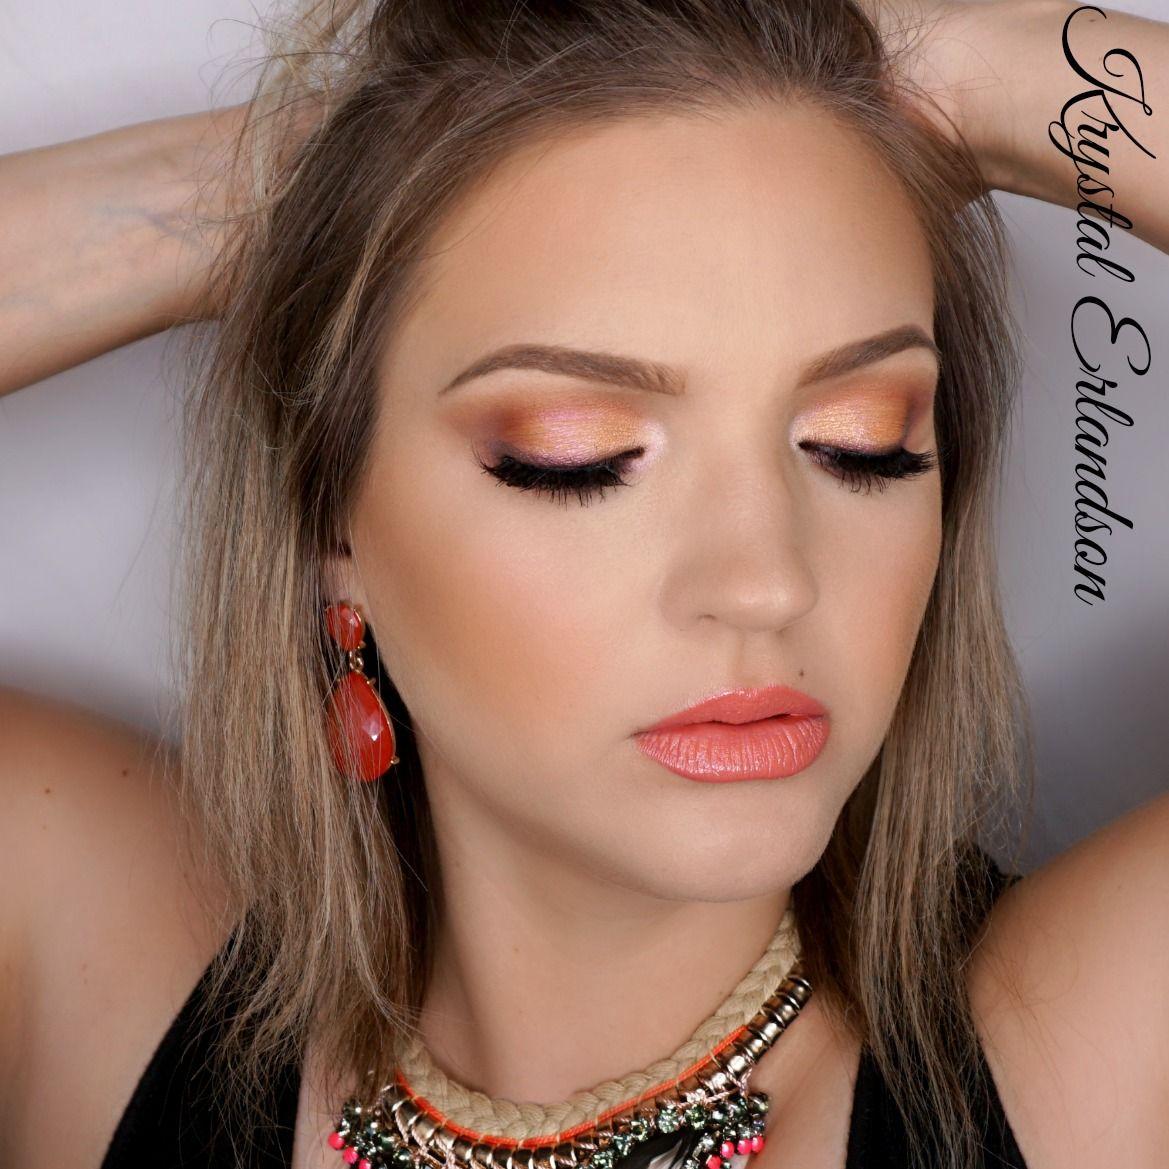 Soft & Pretty Makeup Tutorial Makeup geek, Makeup geek